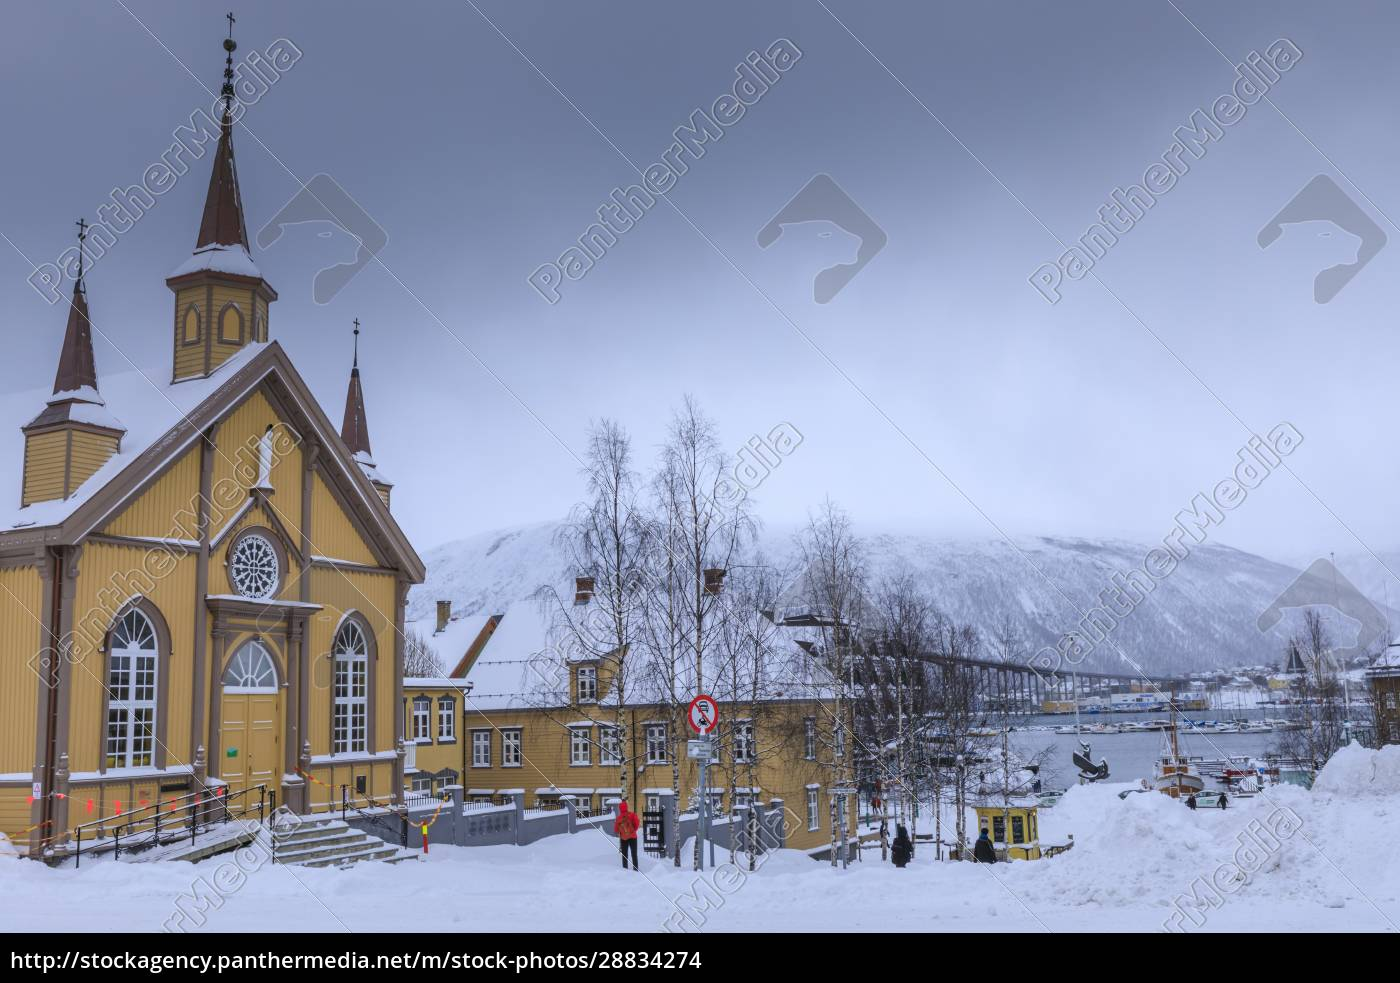 tromso, po, obfitym, śniegu, katedra, katolicka, most, tromso, w - 28834274